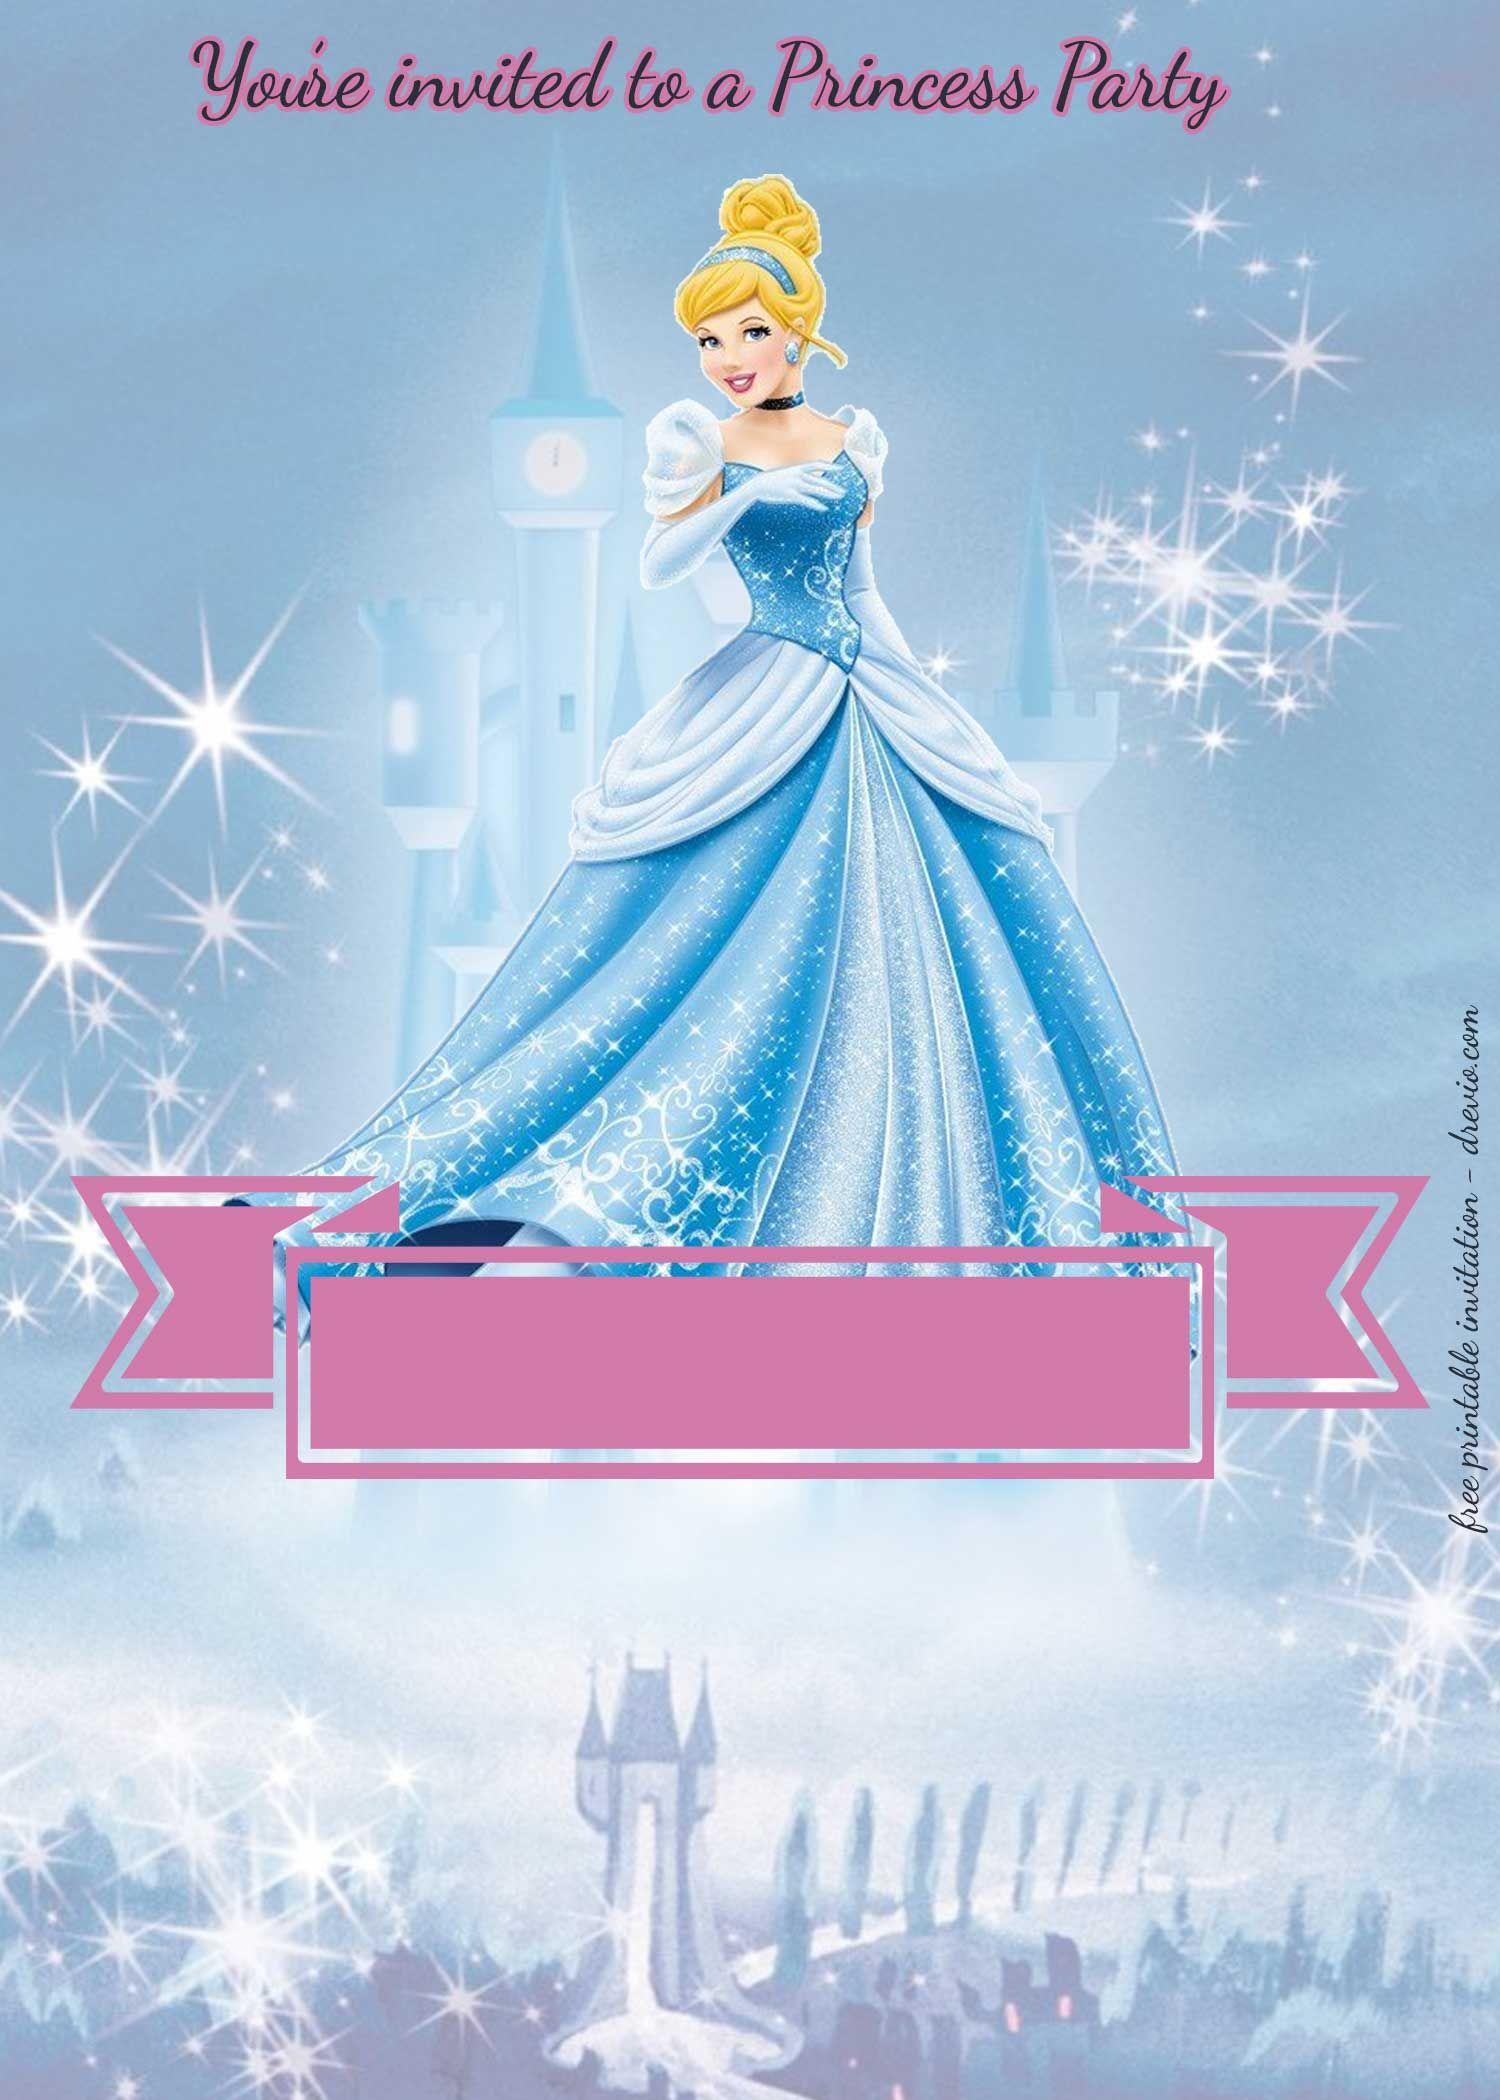 free princess party birthday invitation templates free printable